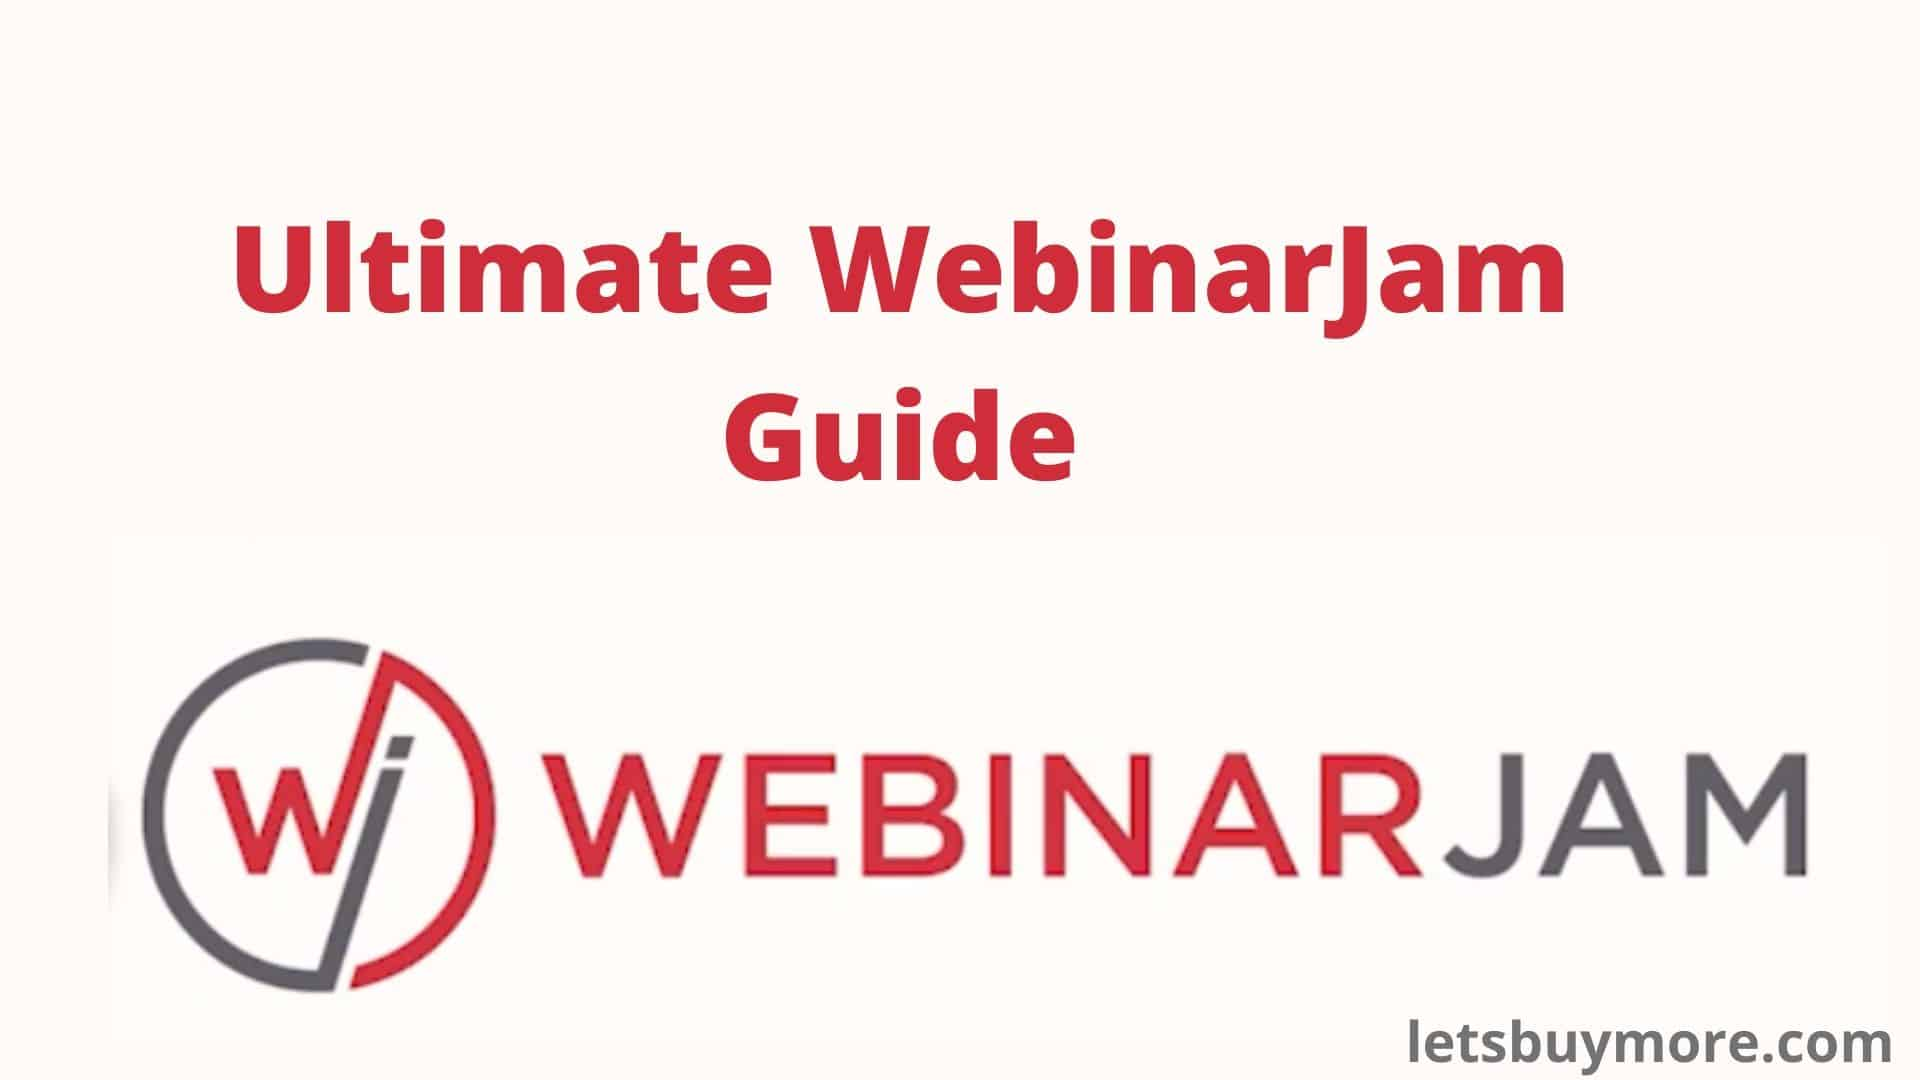 WebinarJam Pricing - Webinar Jam Review Complete Guide